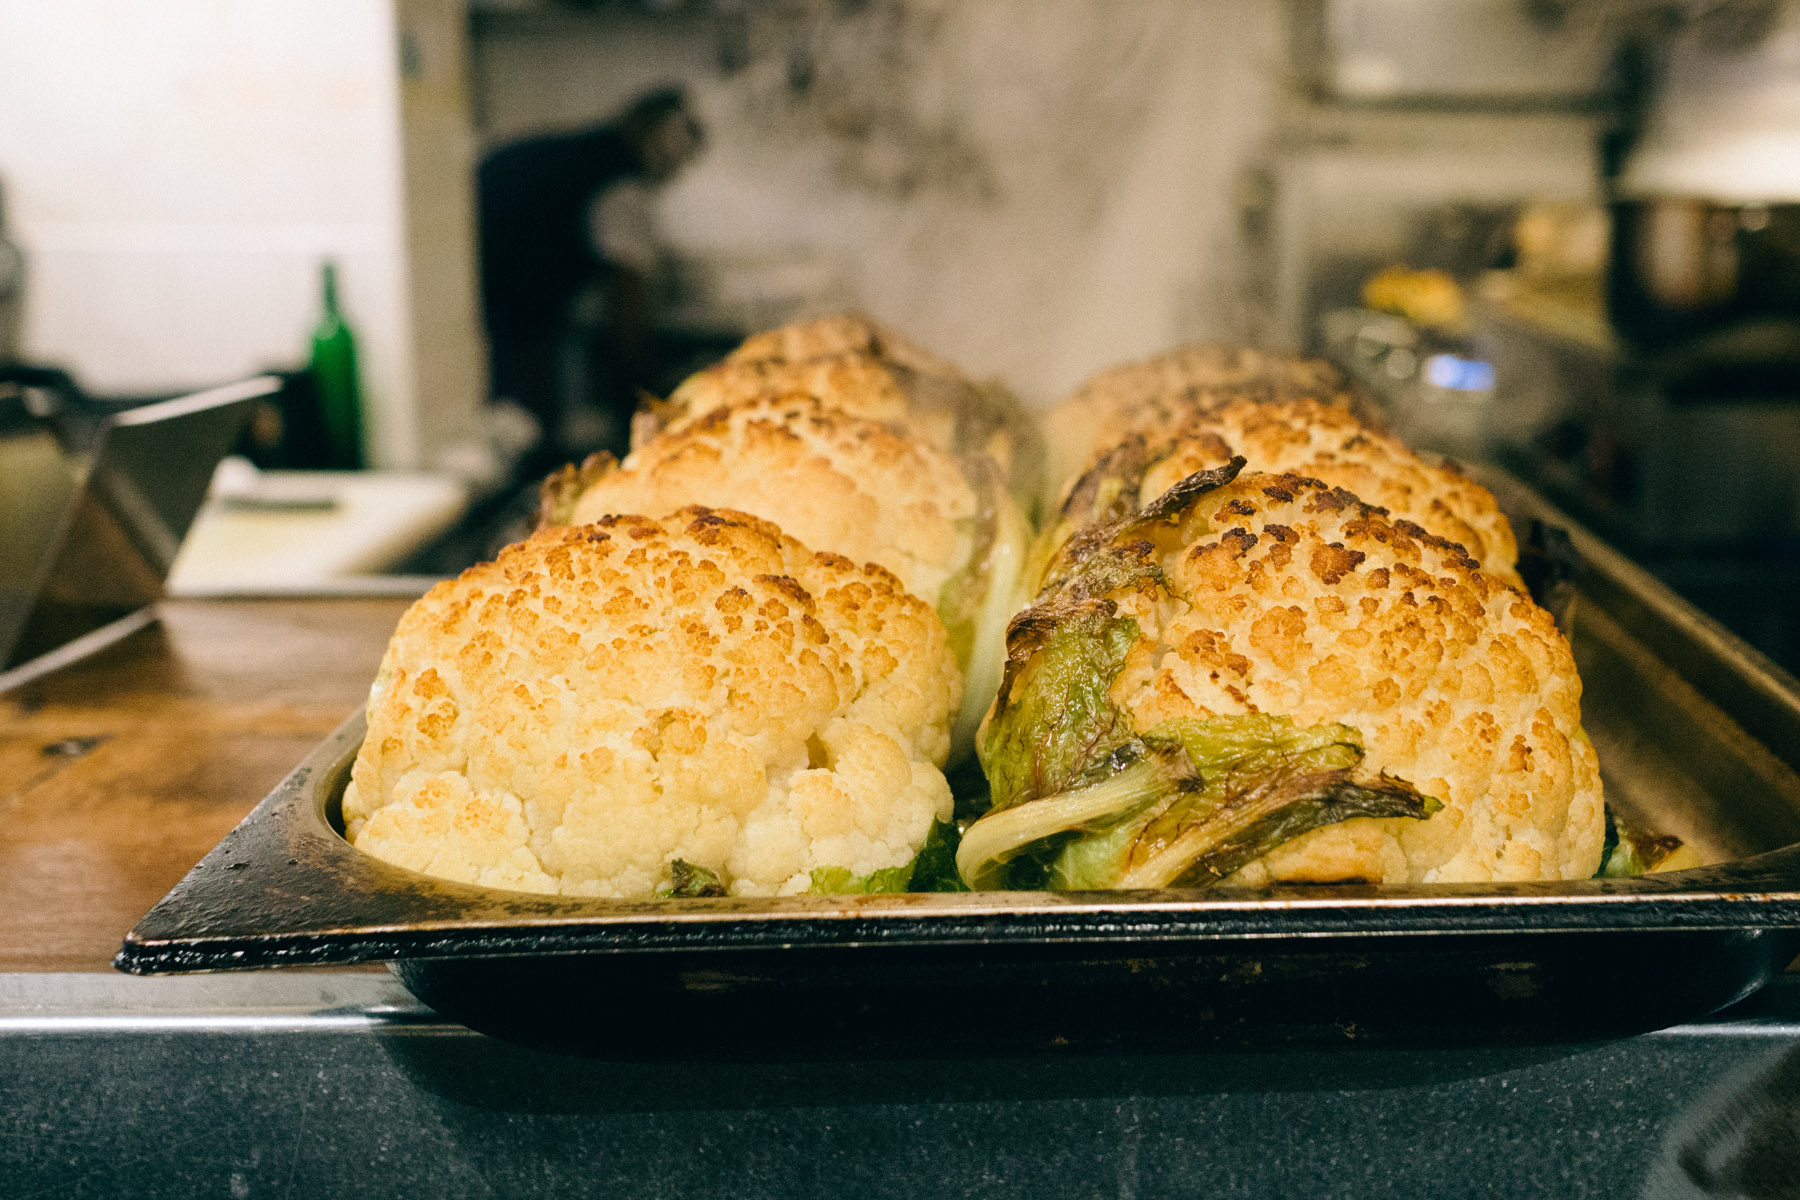 miznon-restaurant-jewish-israeli-parisian-pita-kebabs-paris-france-3